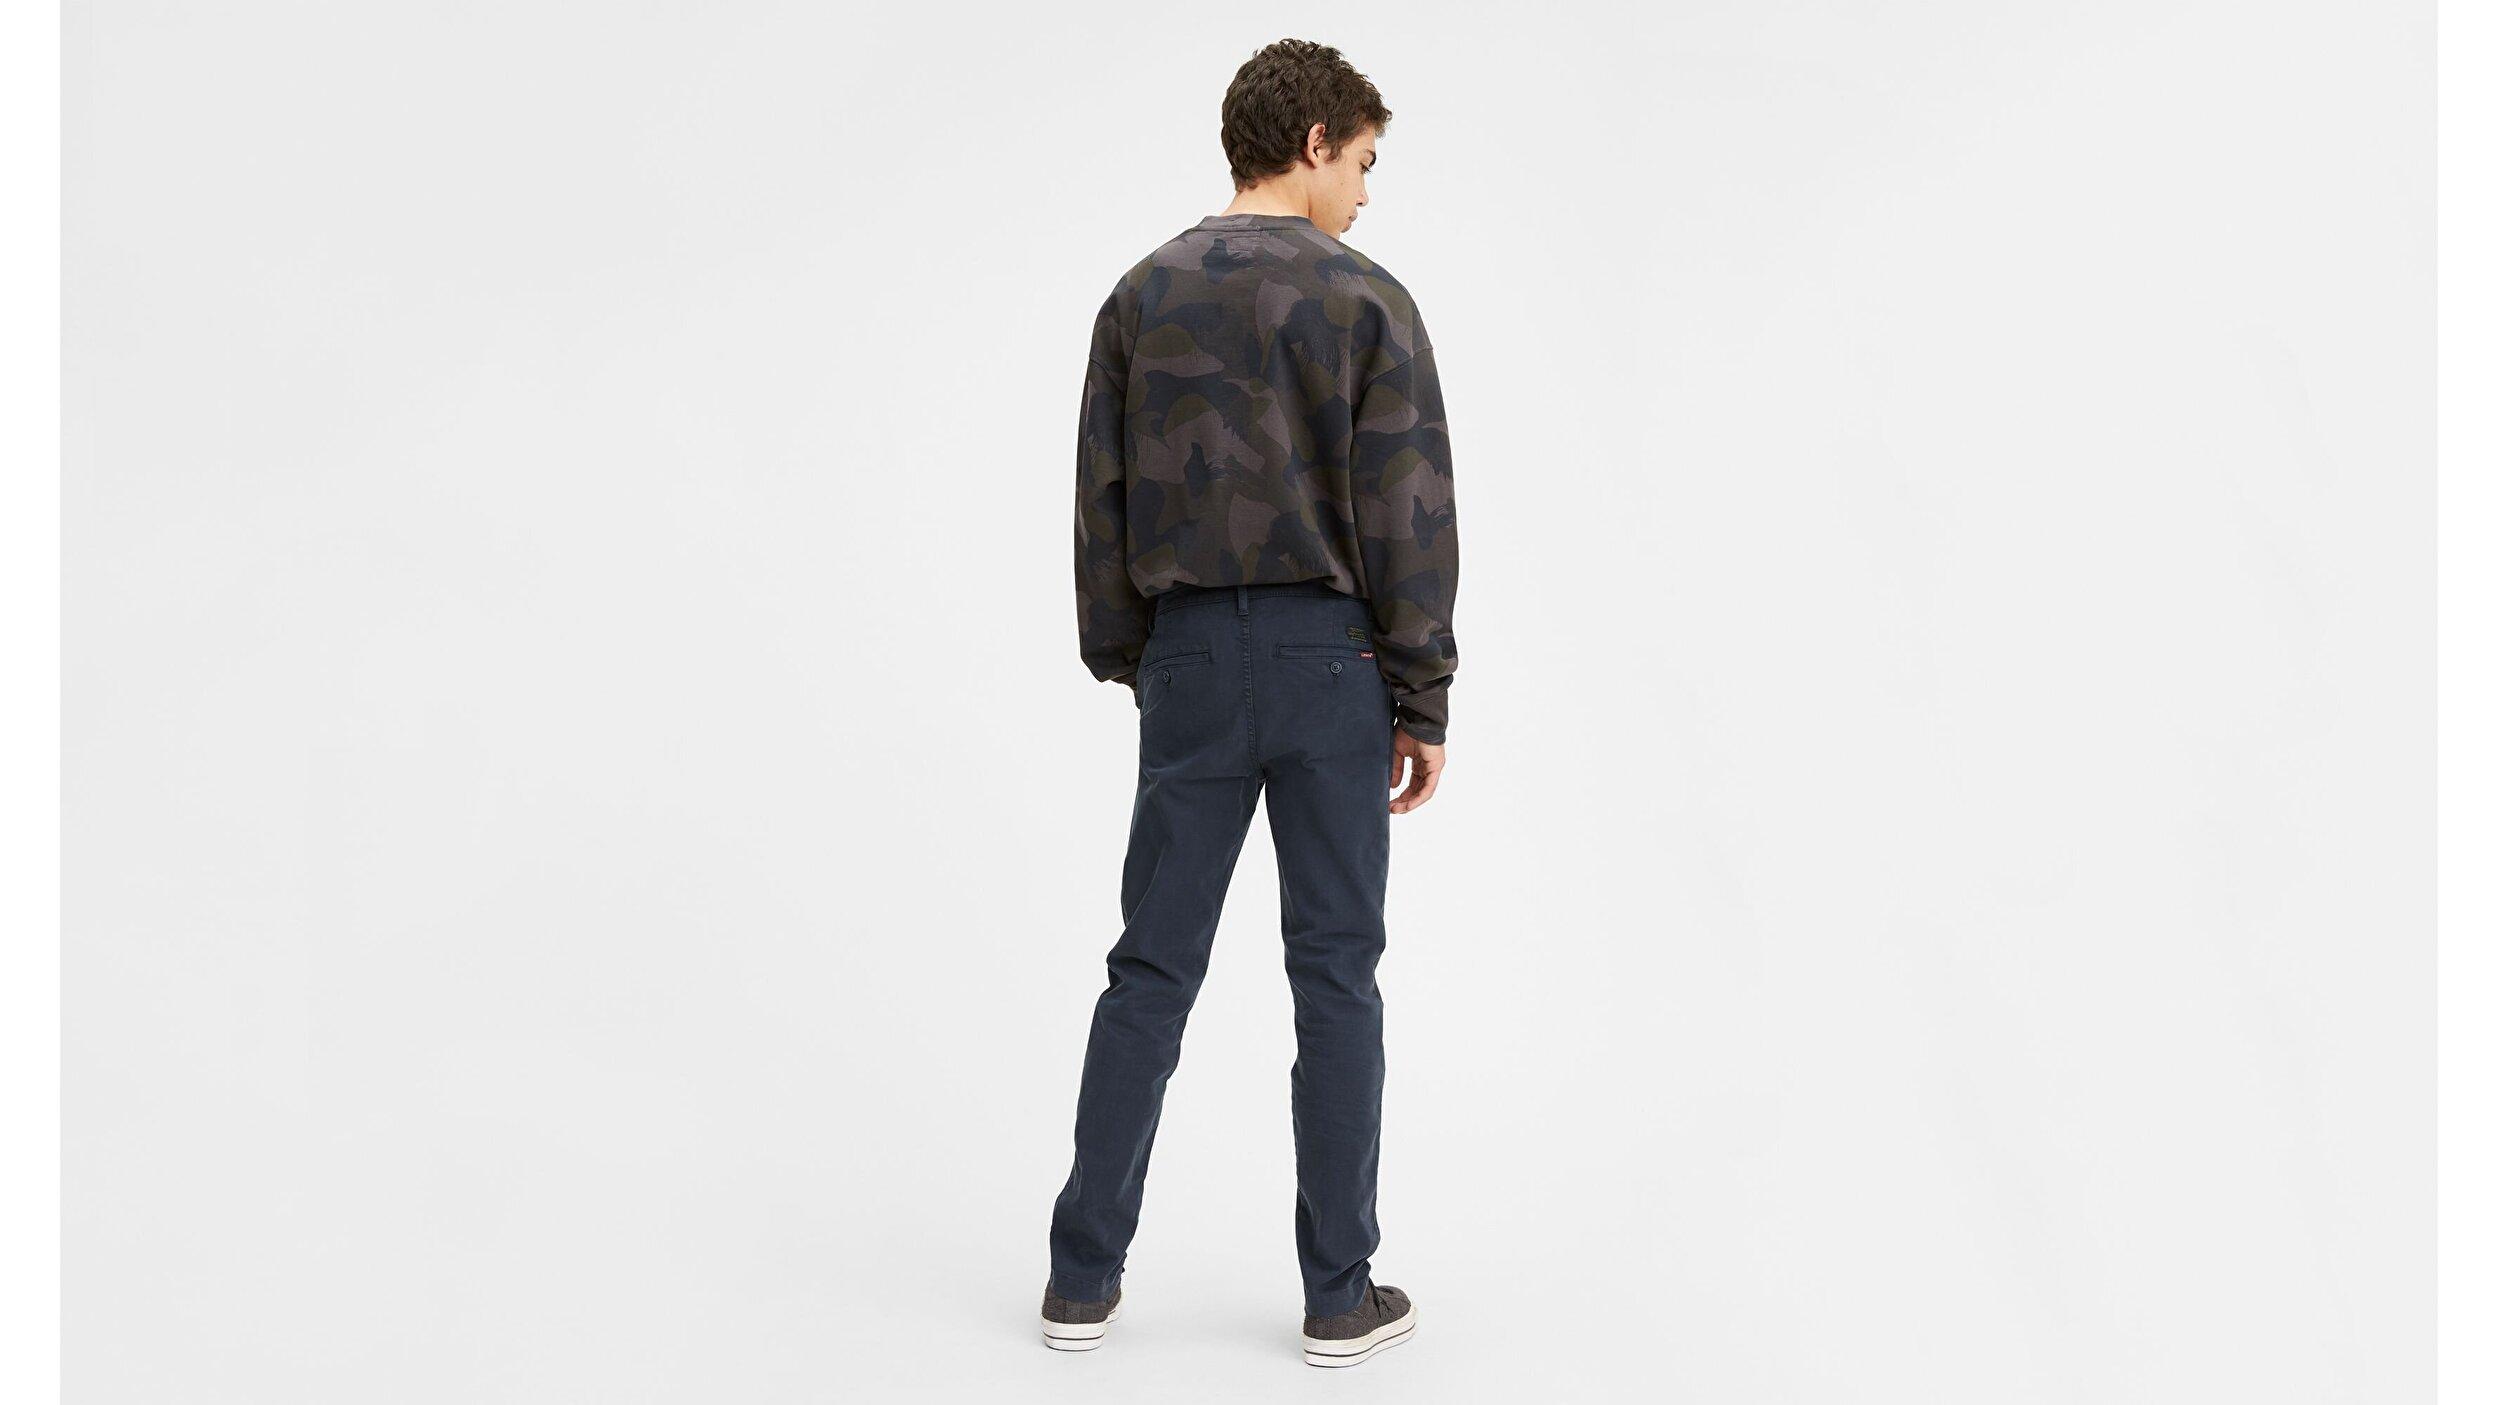 XX Chino Slim Fit Erkek Pantolon-Baltic Shady